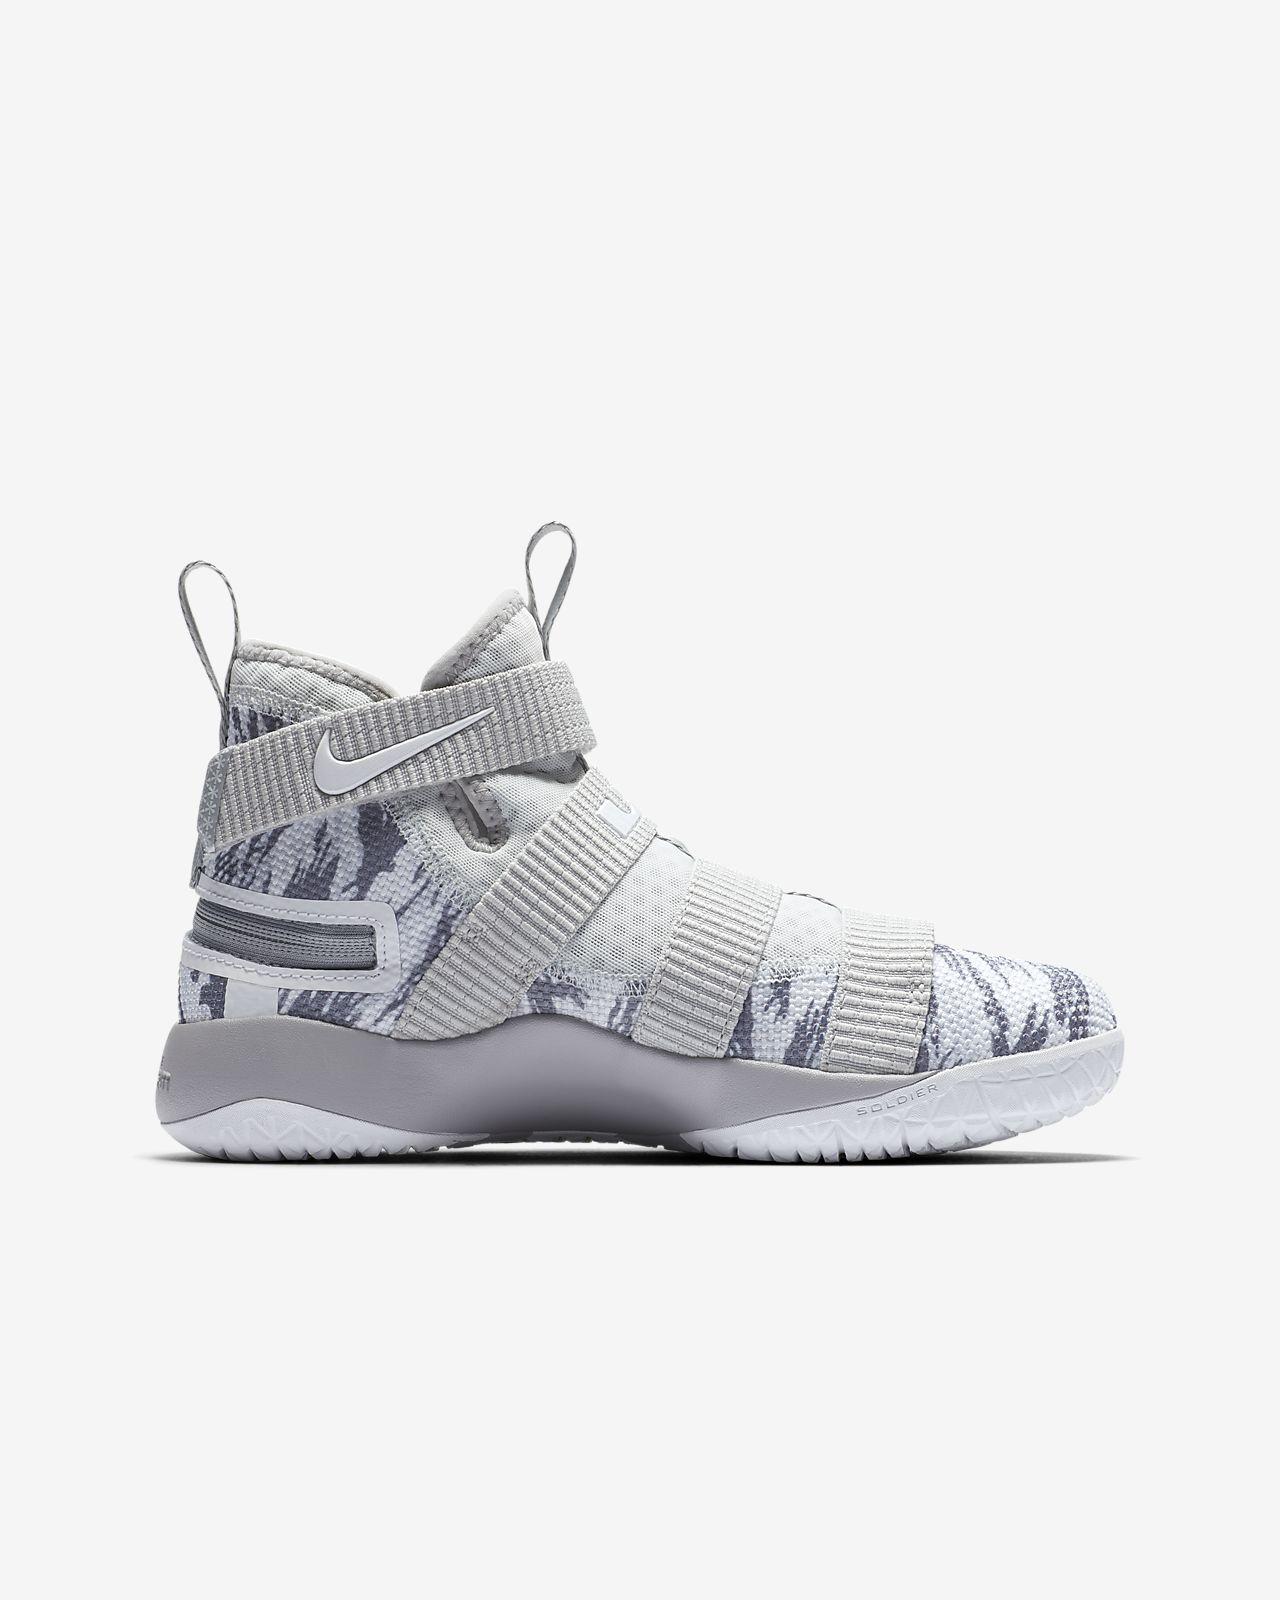 dad64692e15 LeBron Soldier 11 FlyEase Big Kids  Basketball Shoe. Nike.com